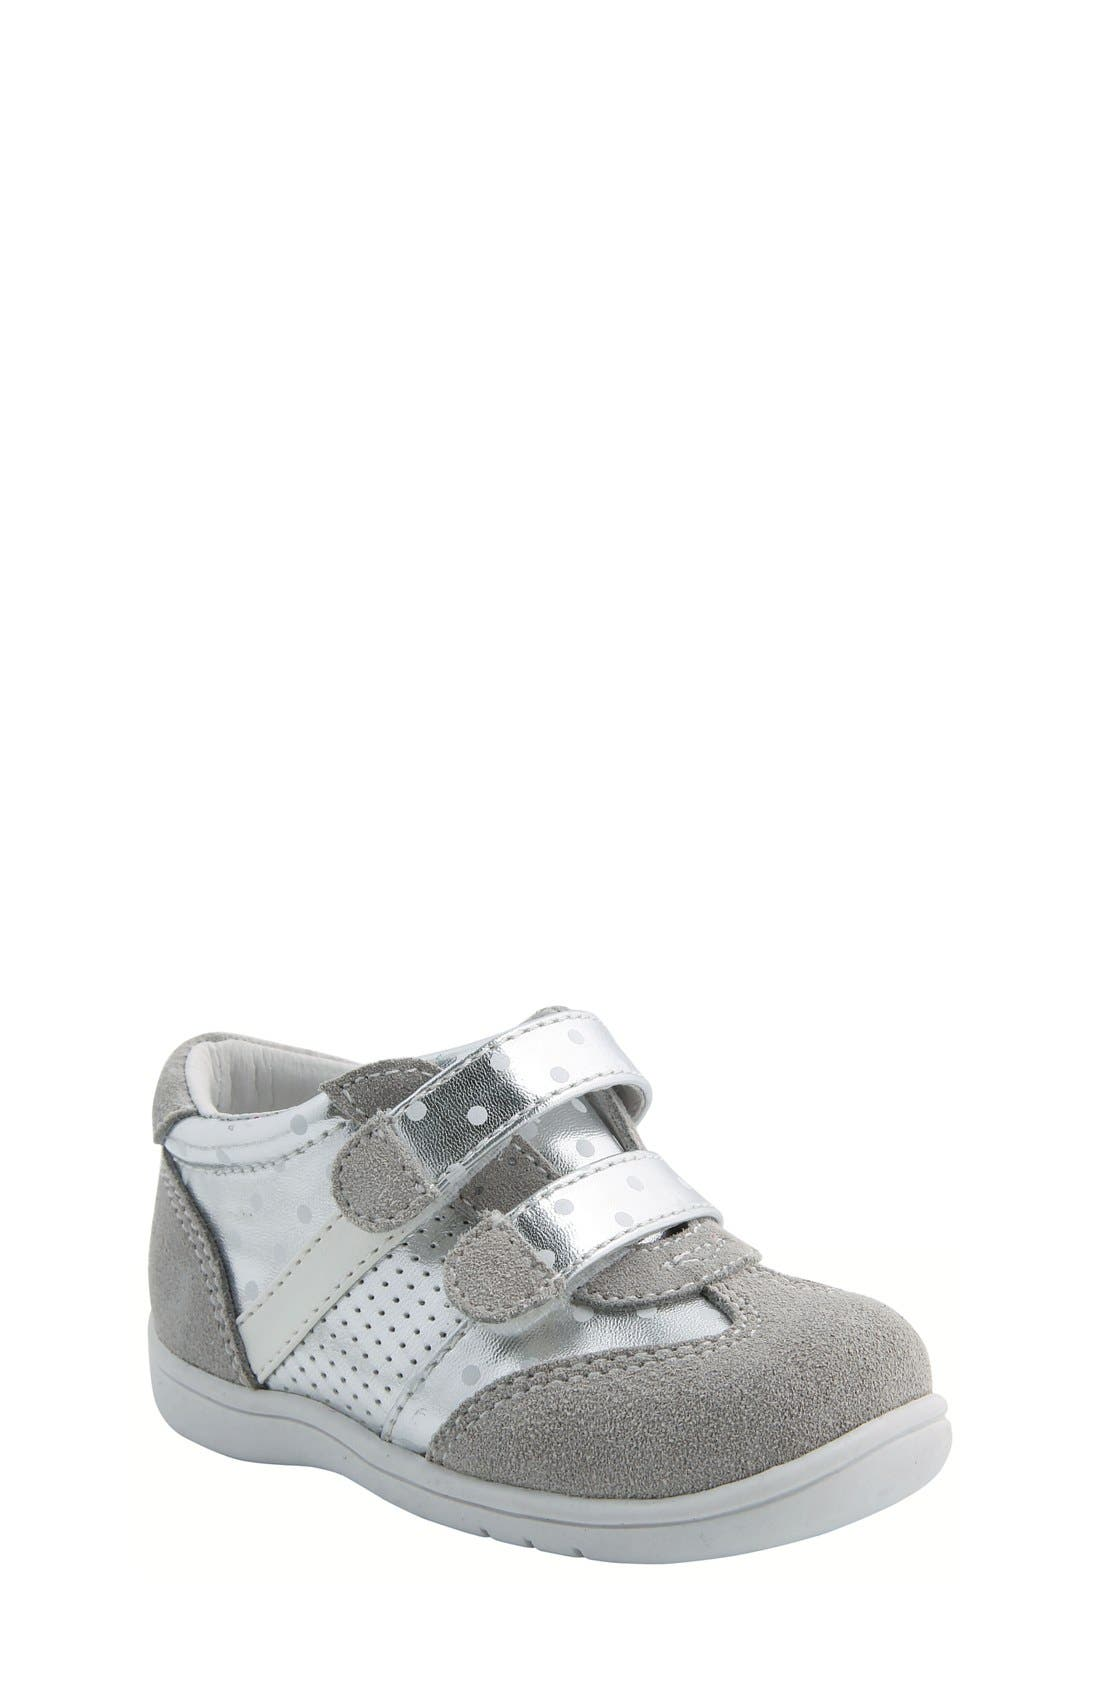 Nina 'Everest' Sneaker,                         Main,                         color, Silver